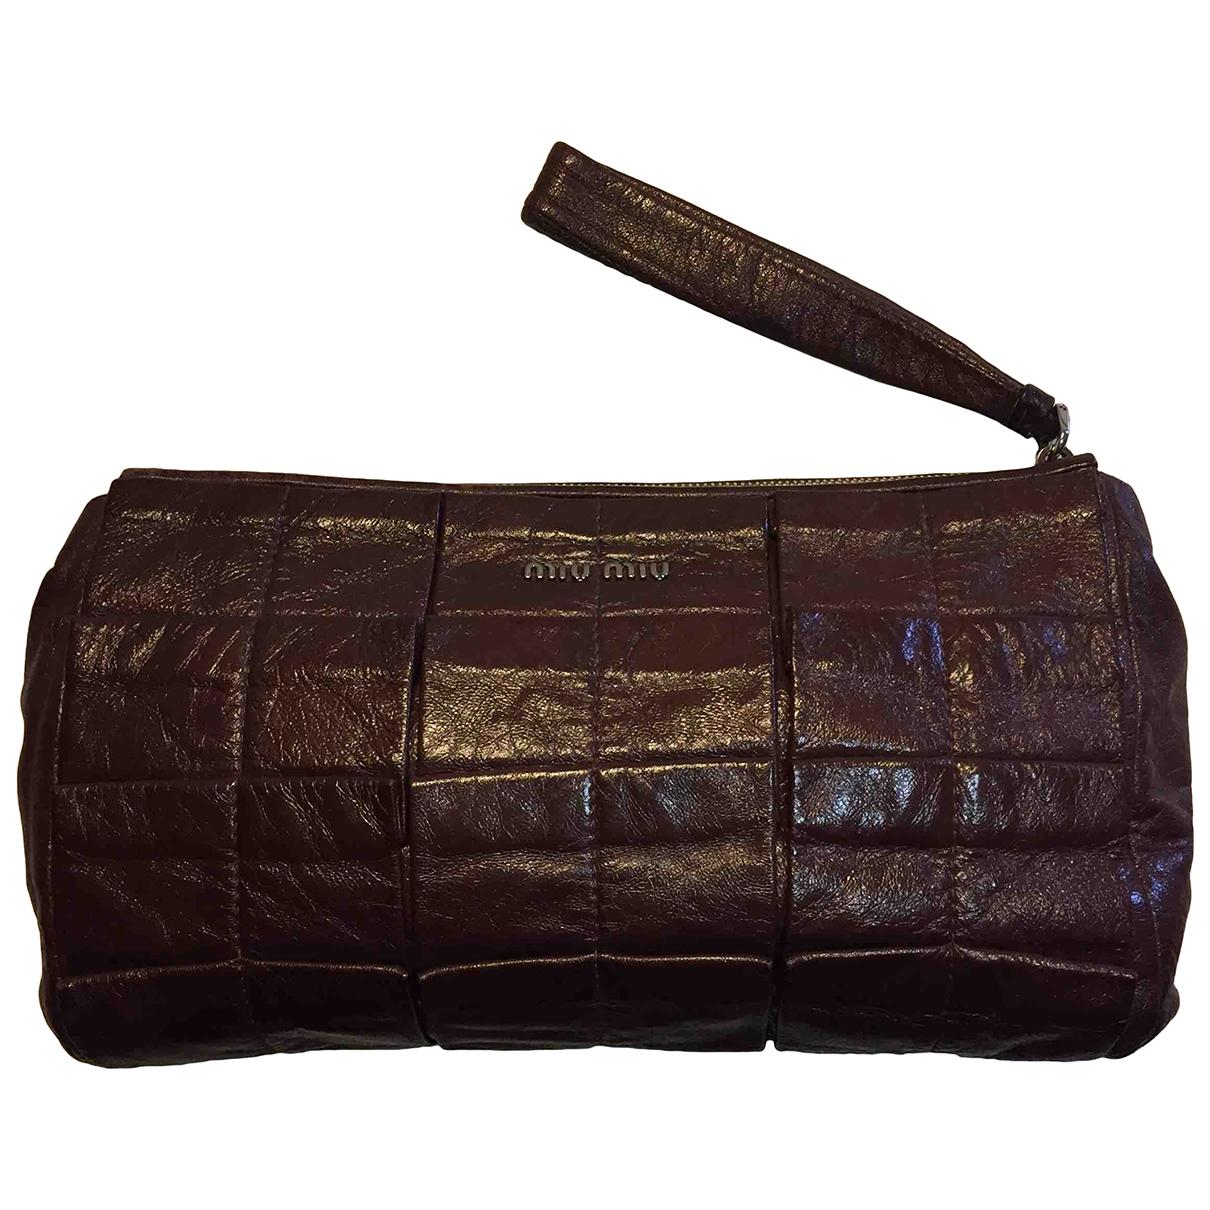 Miu Miu \N Brown Leather Clutch bag for Women \N